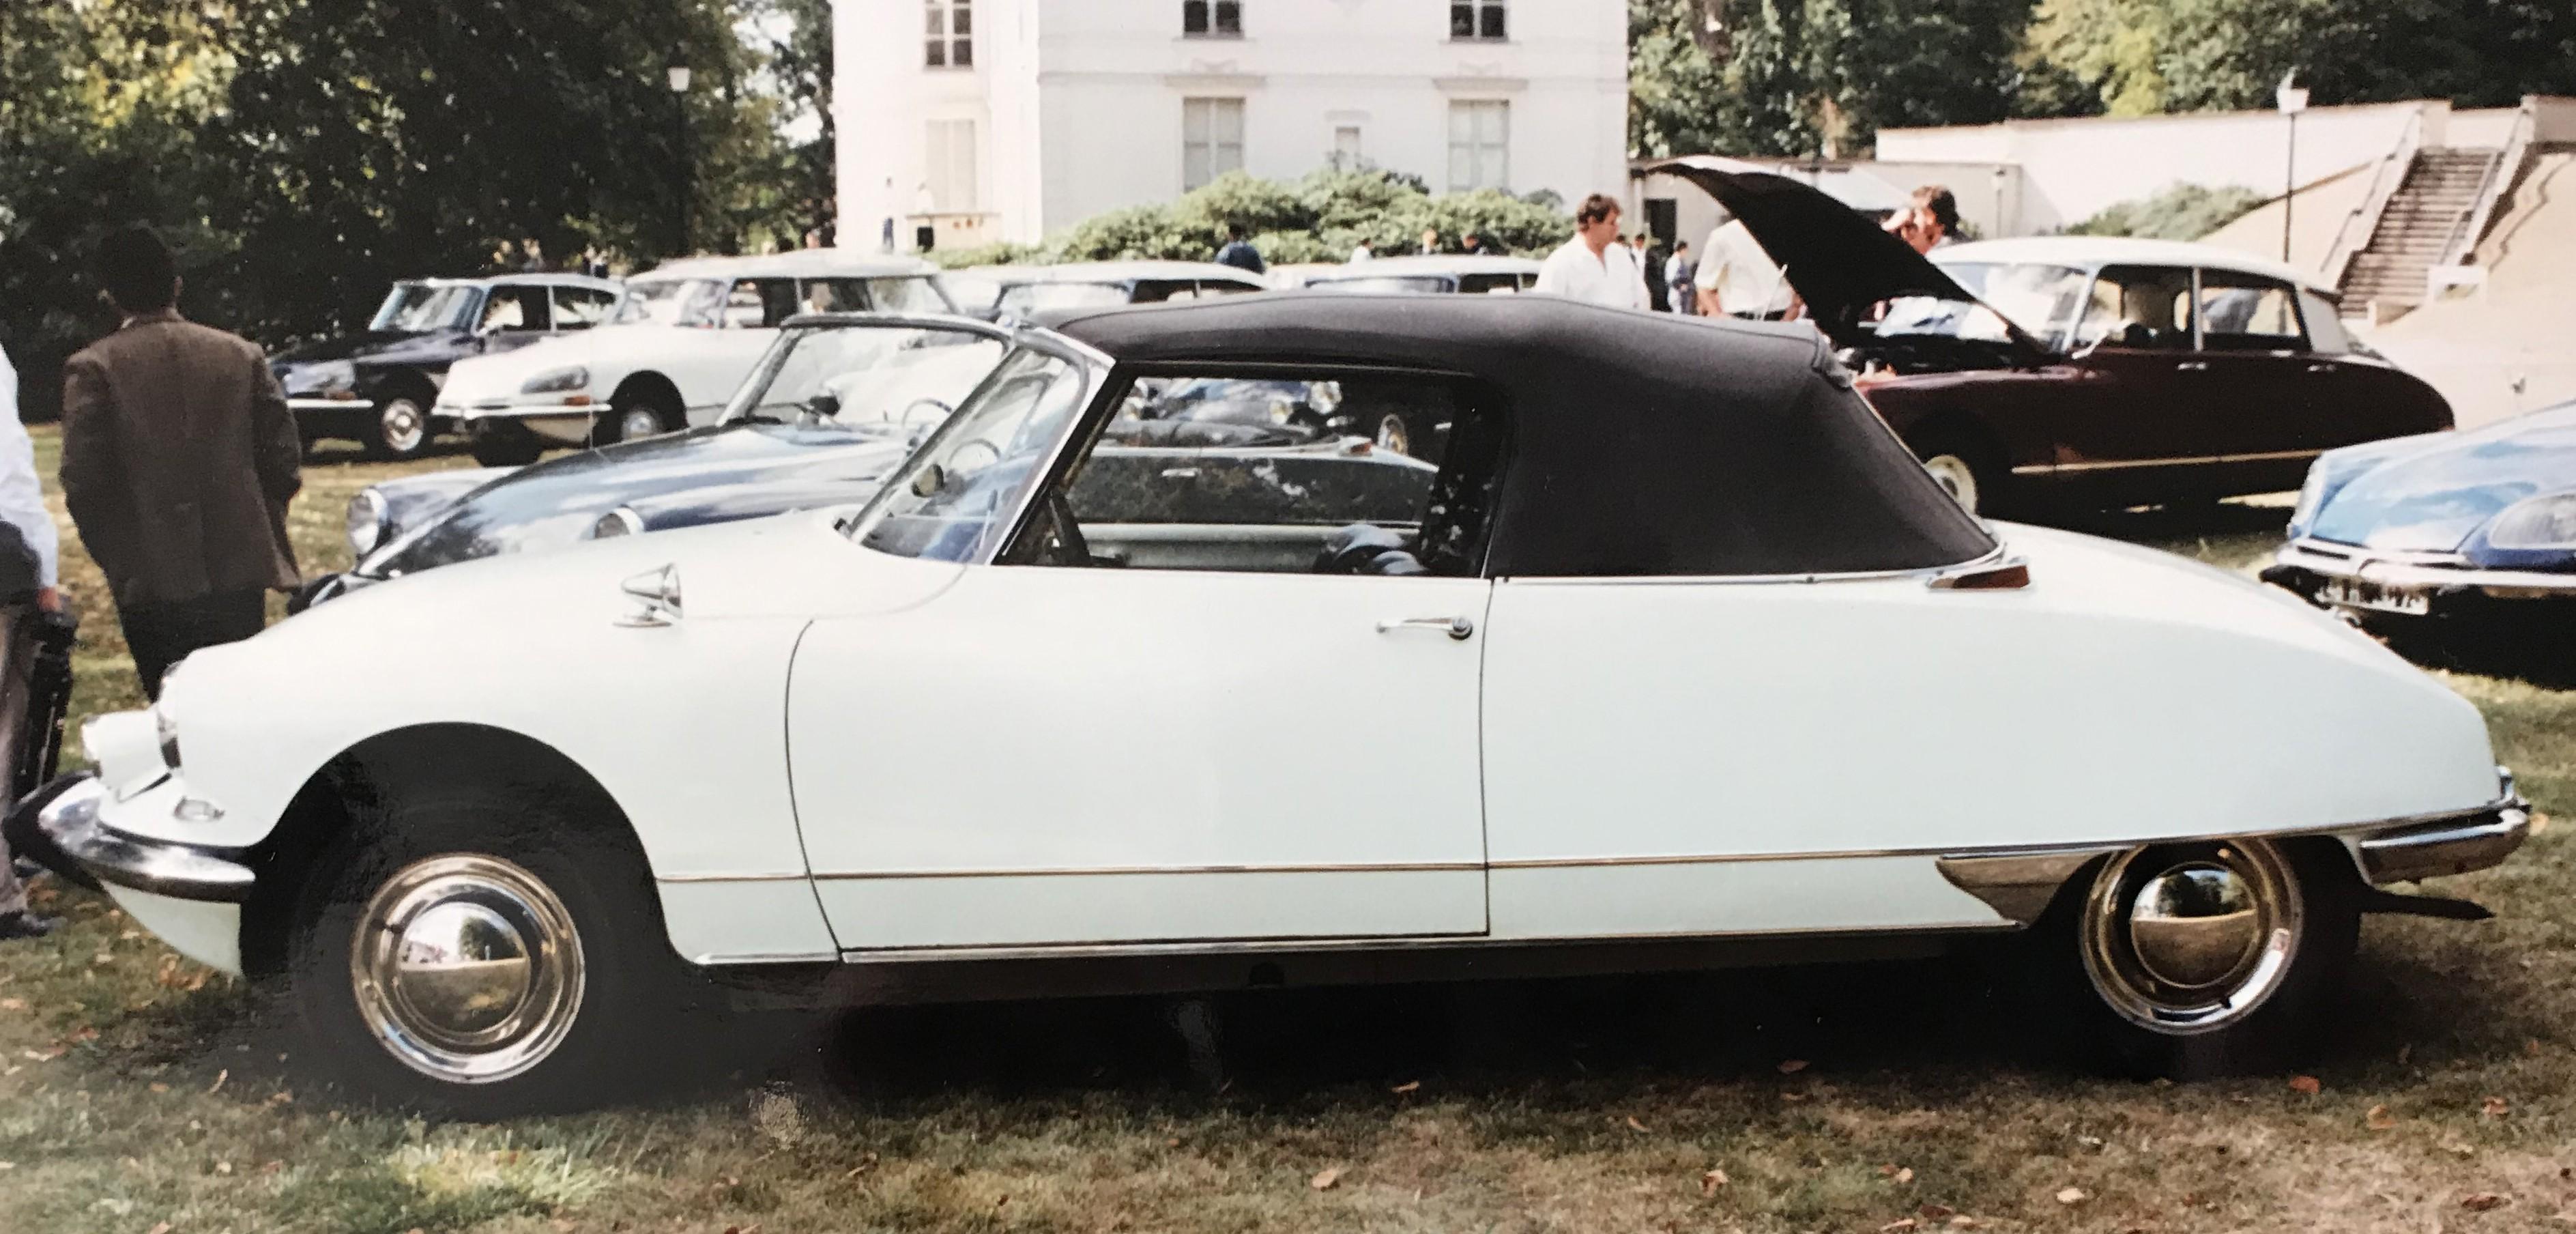 1964 DS19 cabriolet usine